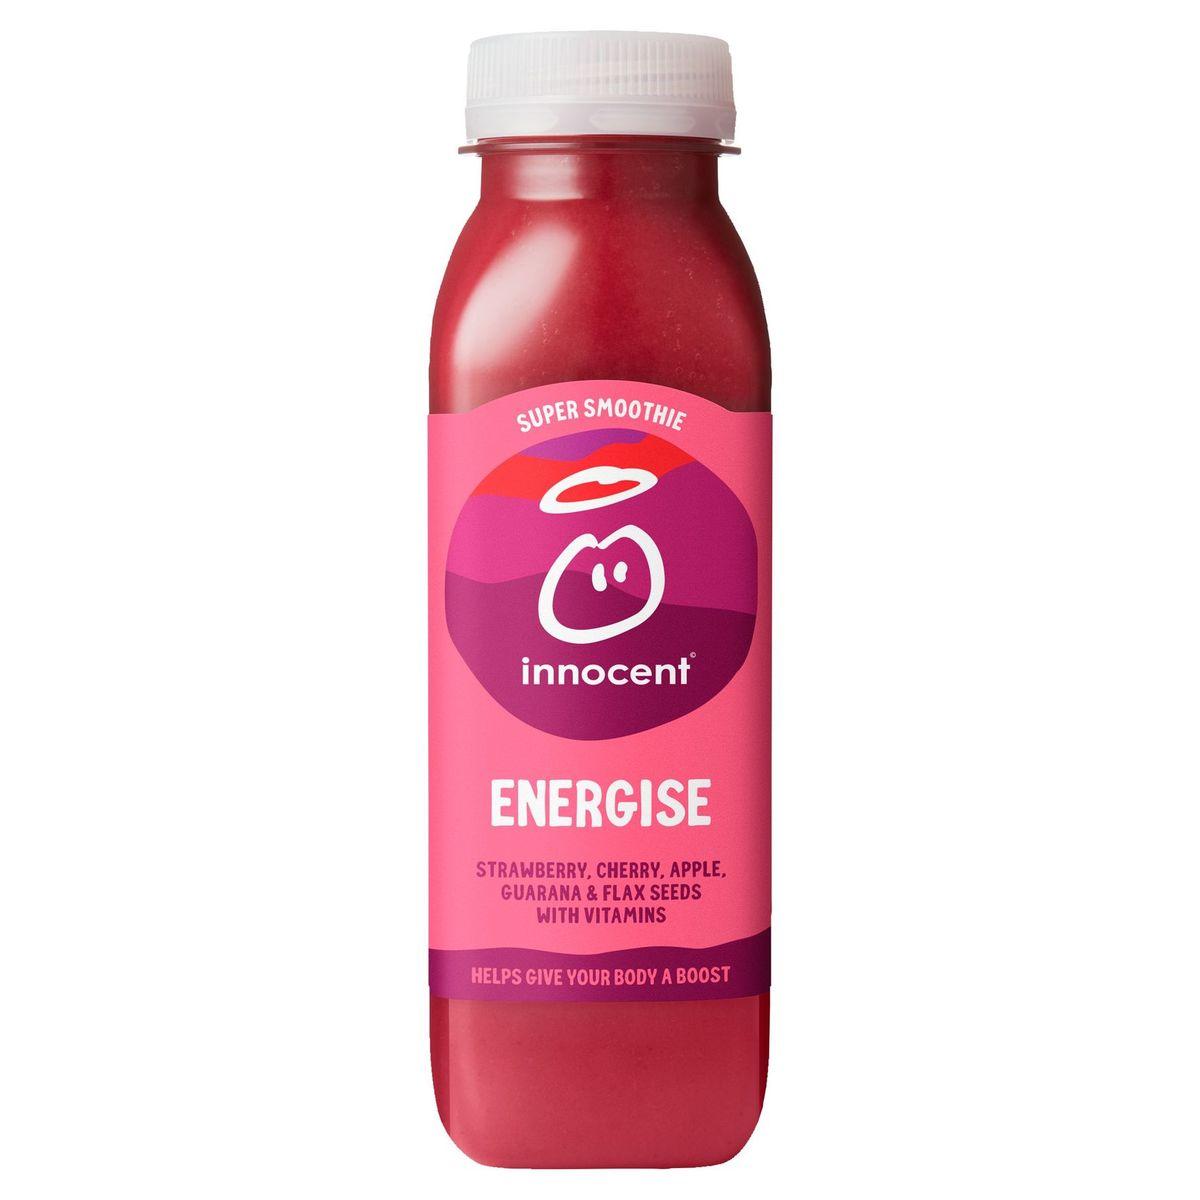 Innocent Super Smoothie Energise 300 ml